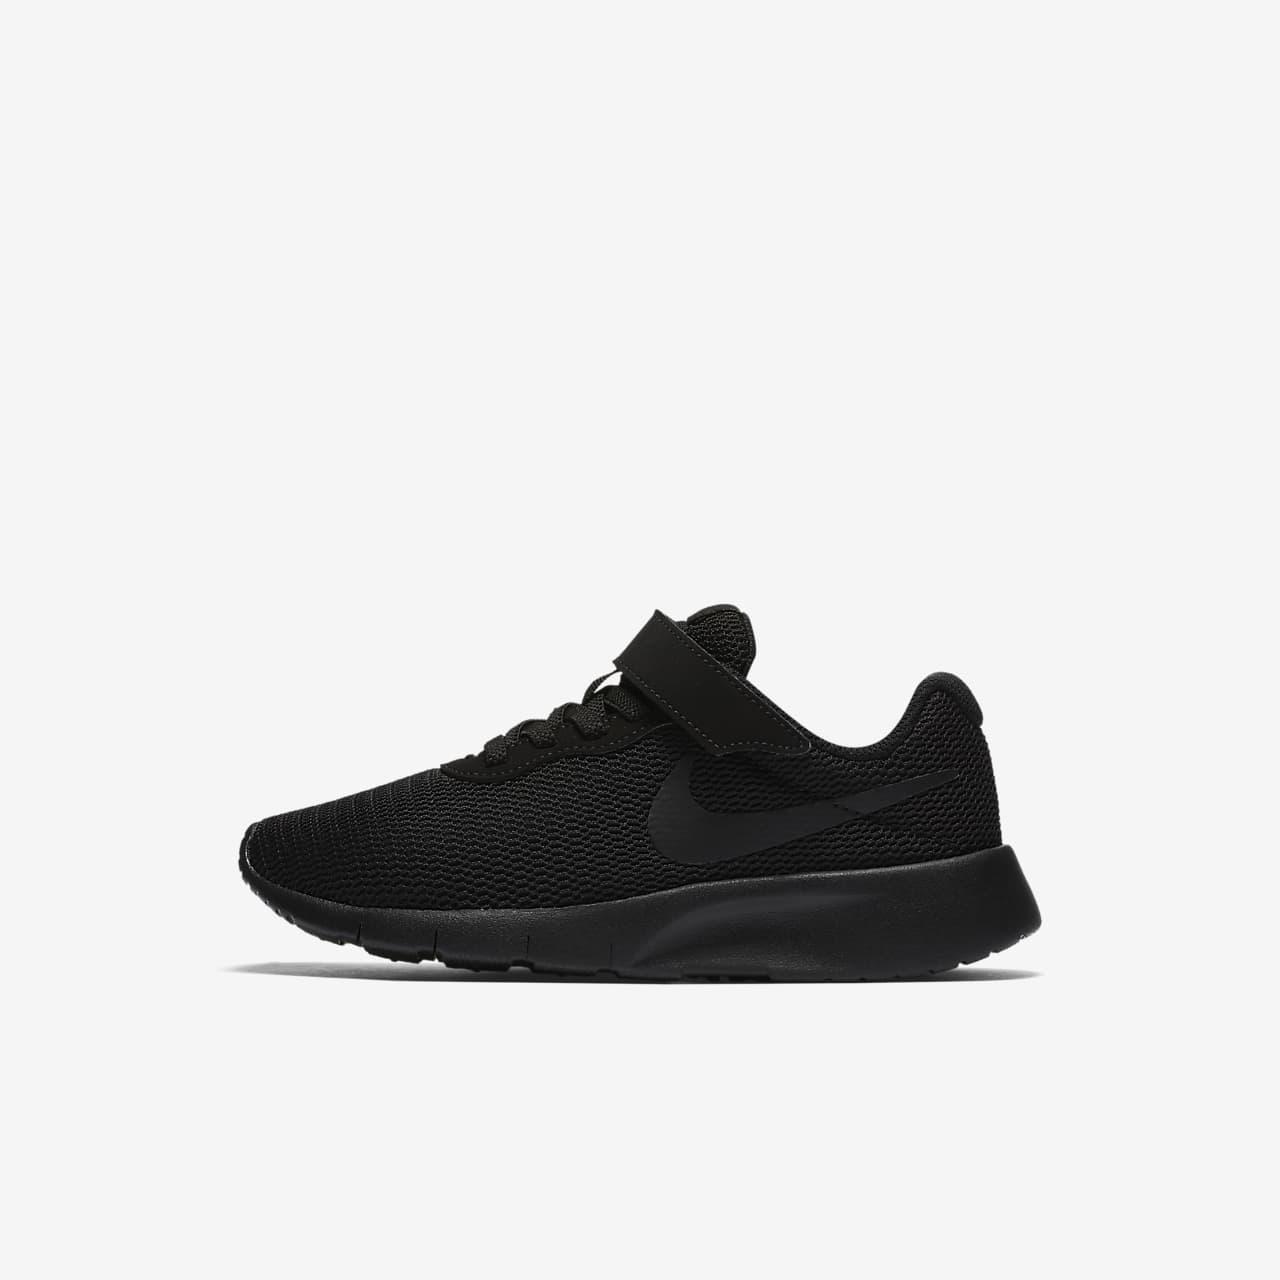 Nike Tanjun - sko til små børn (27,5-35)